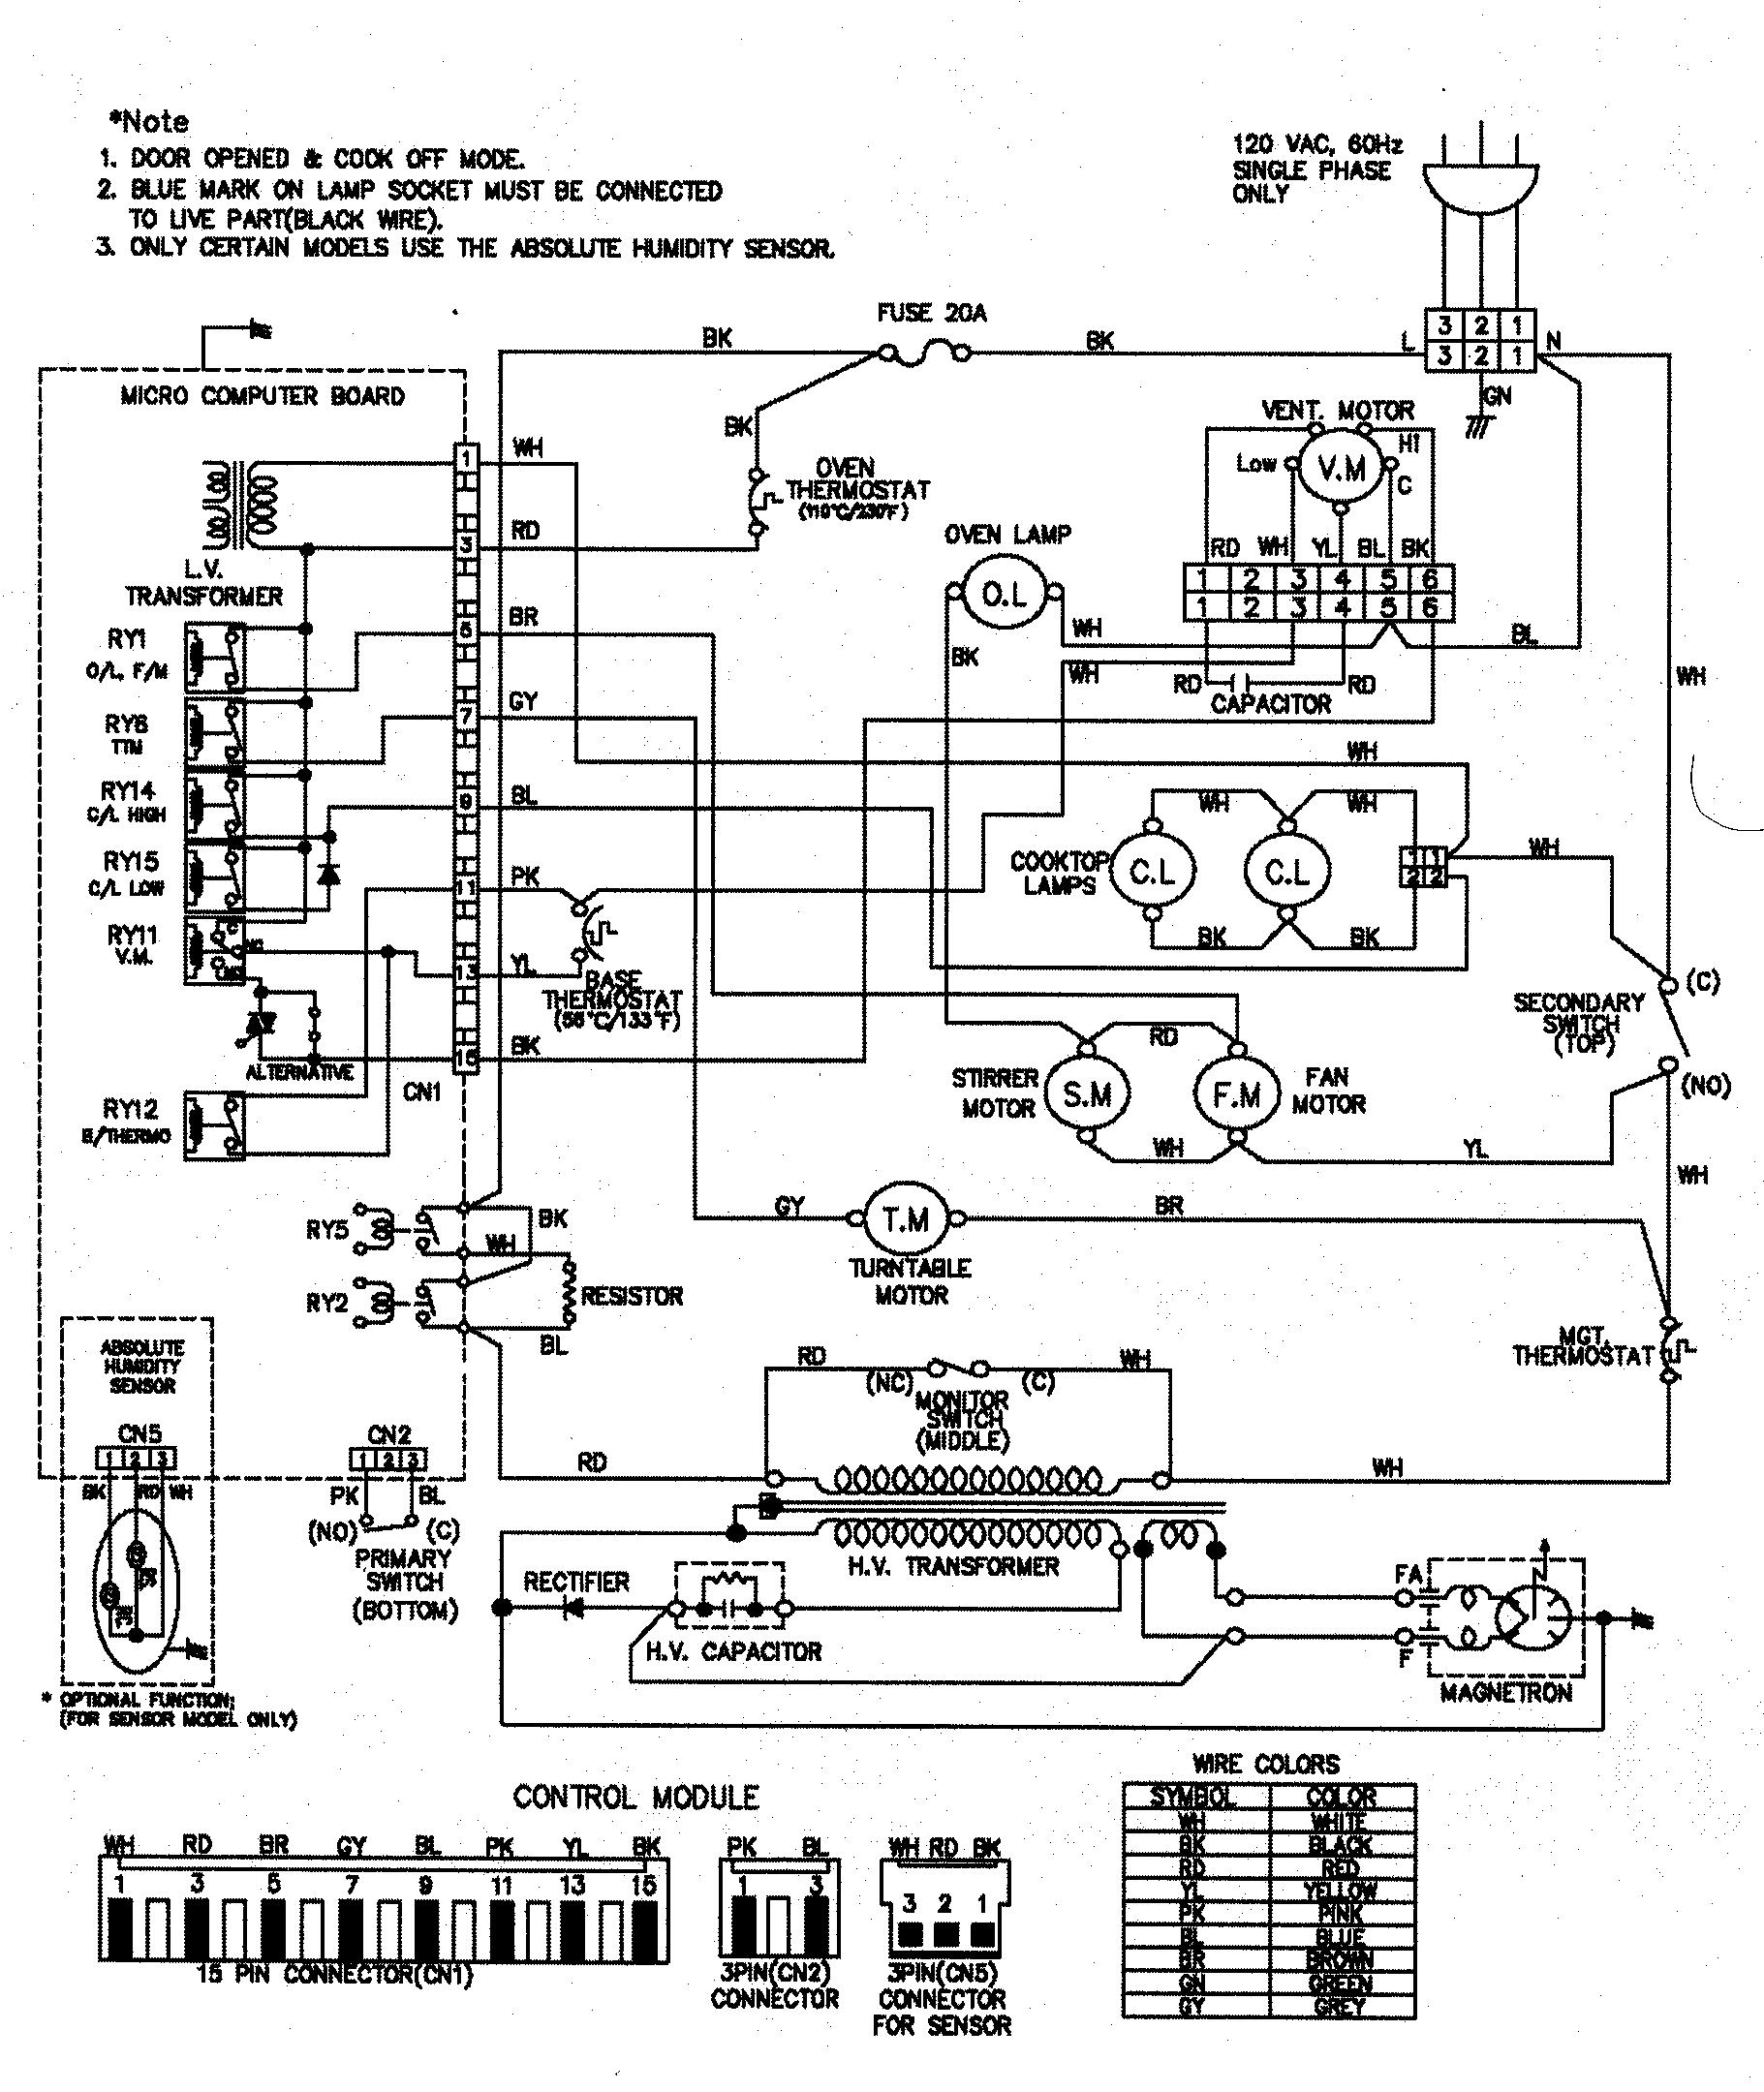 delco radio wiring diagram model 16213825 cobray m11